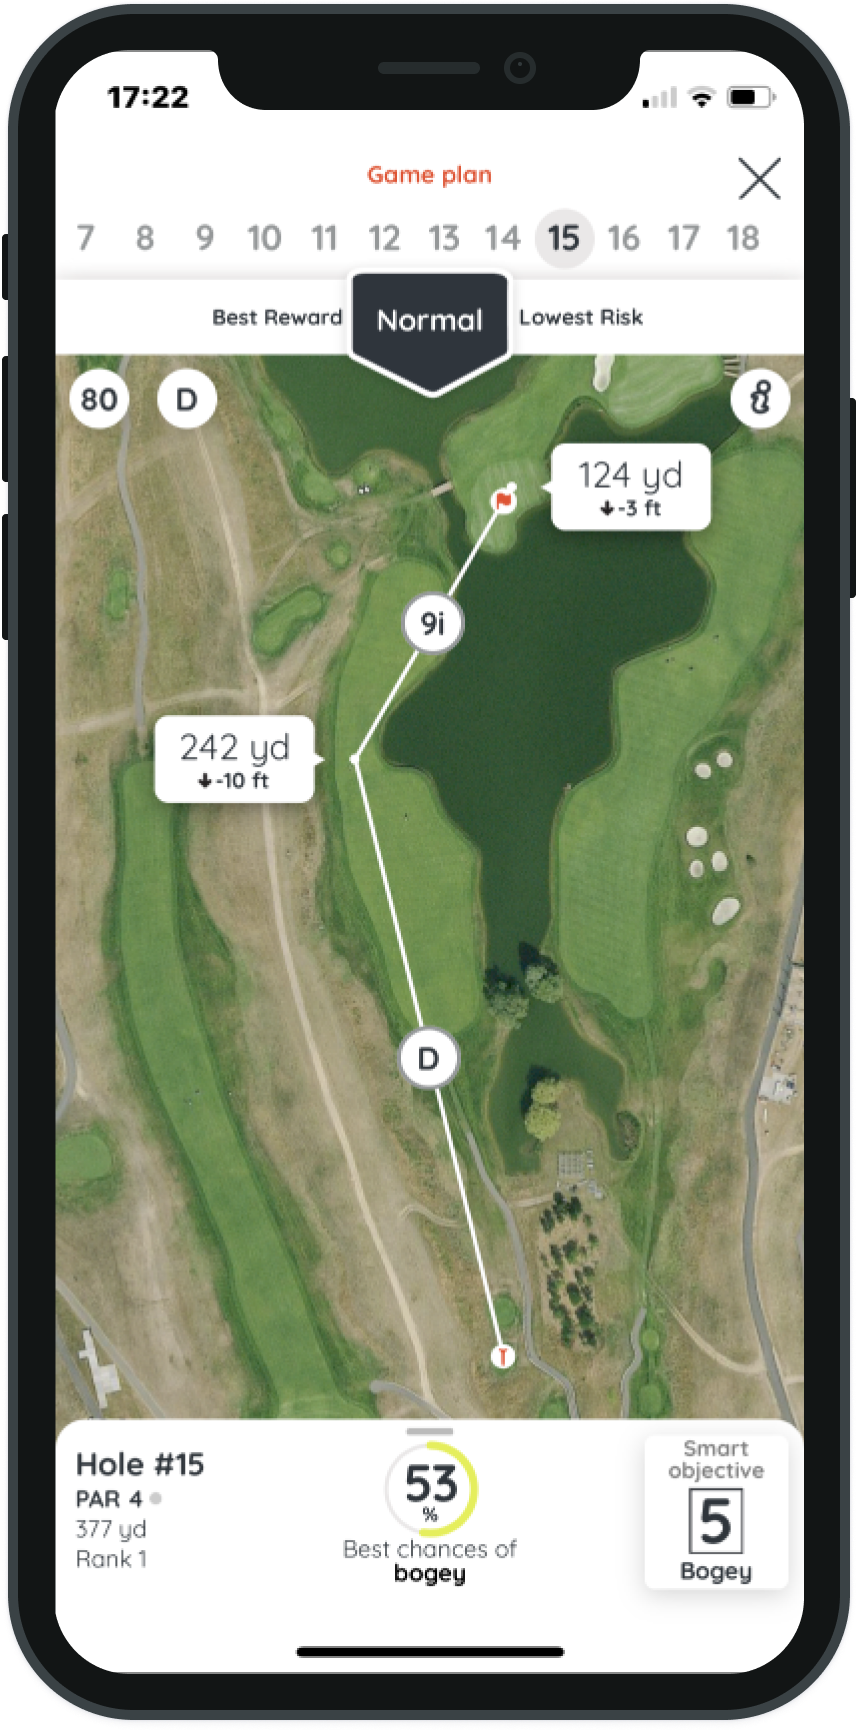 Golf plan